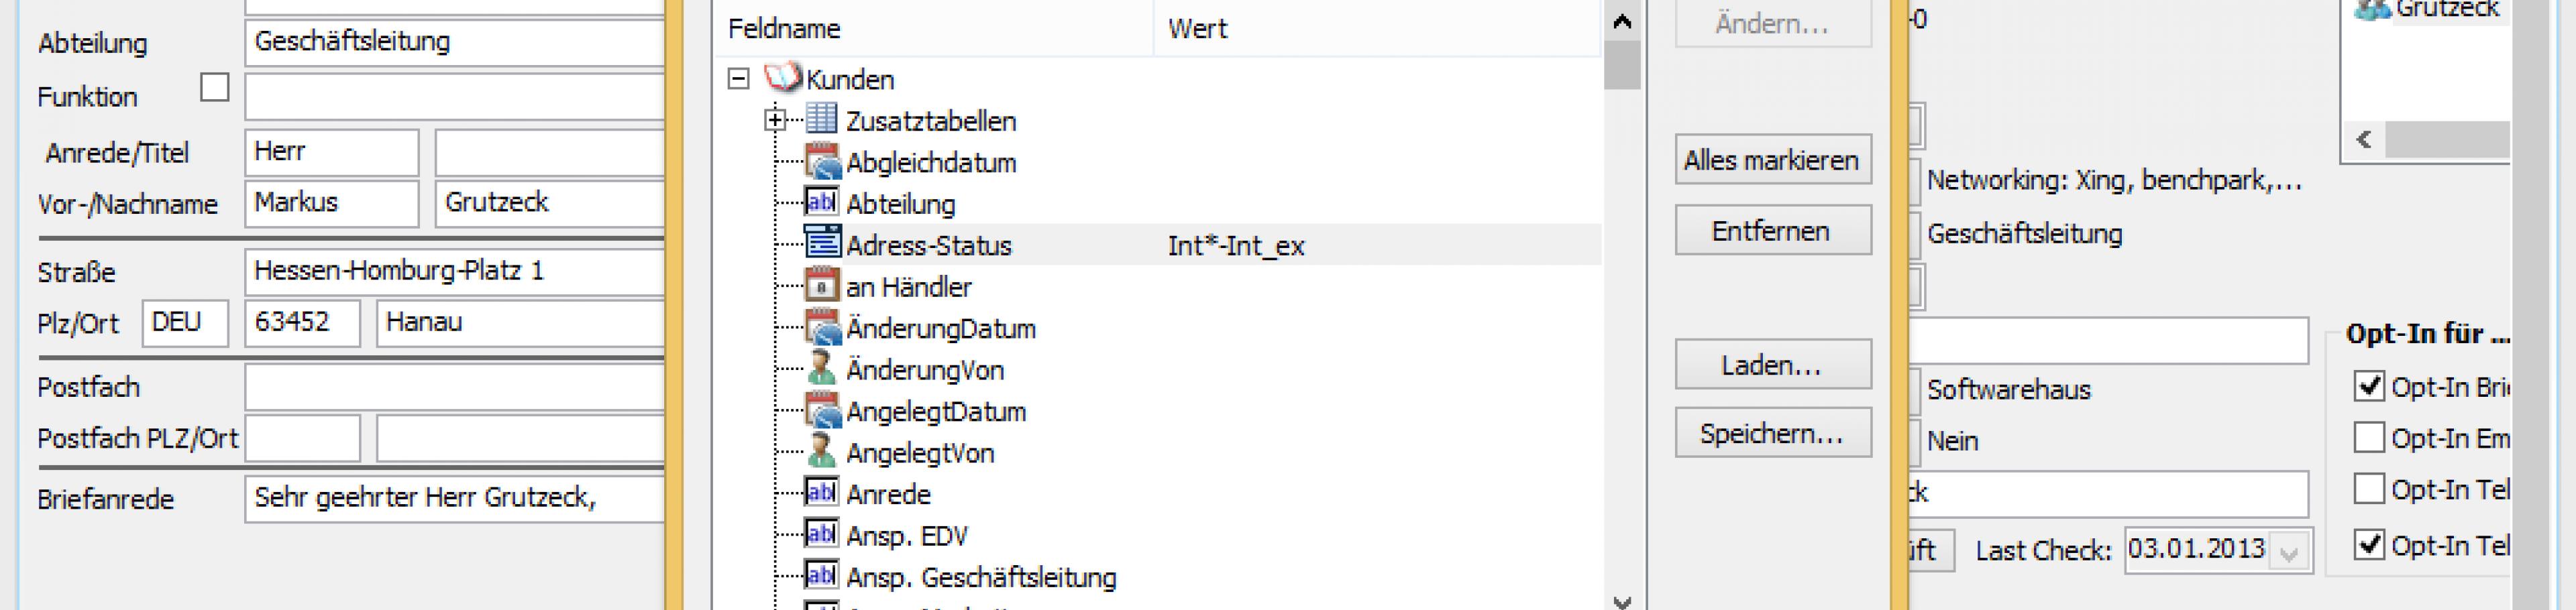 CRM Software AG-VIP SQL - freie Zielgruppenselektion